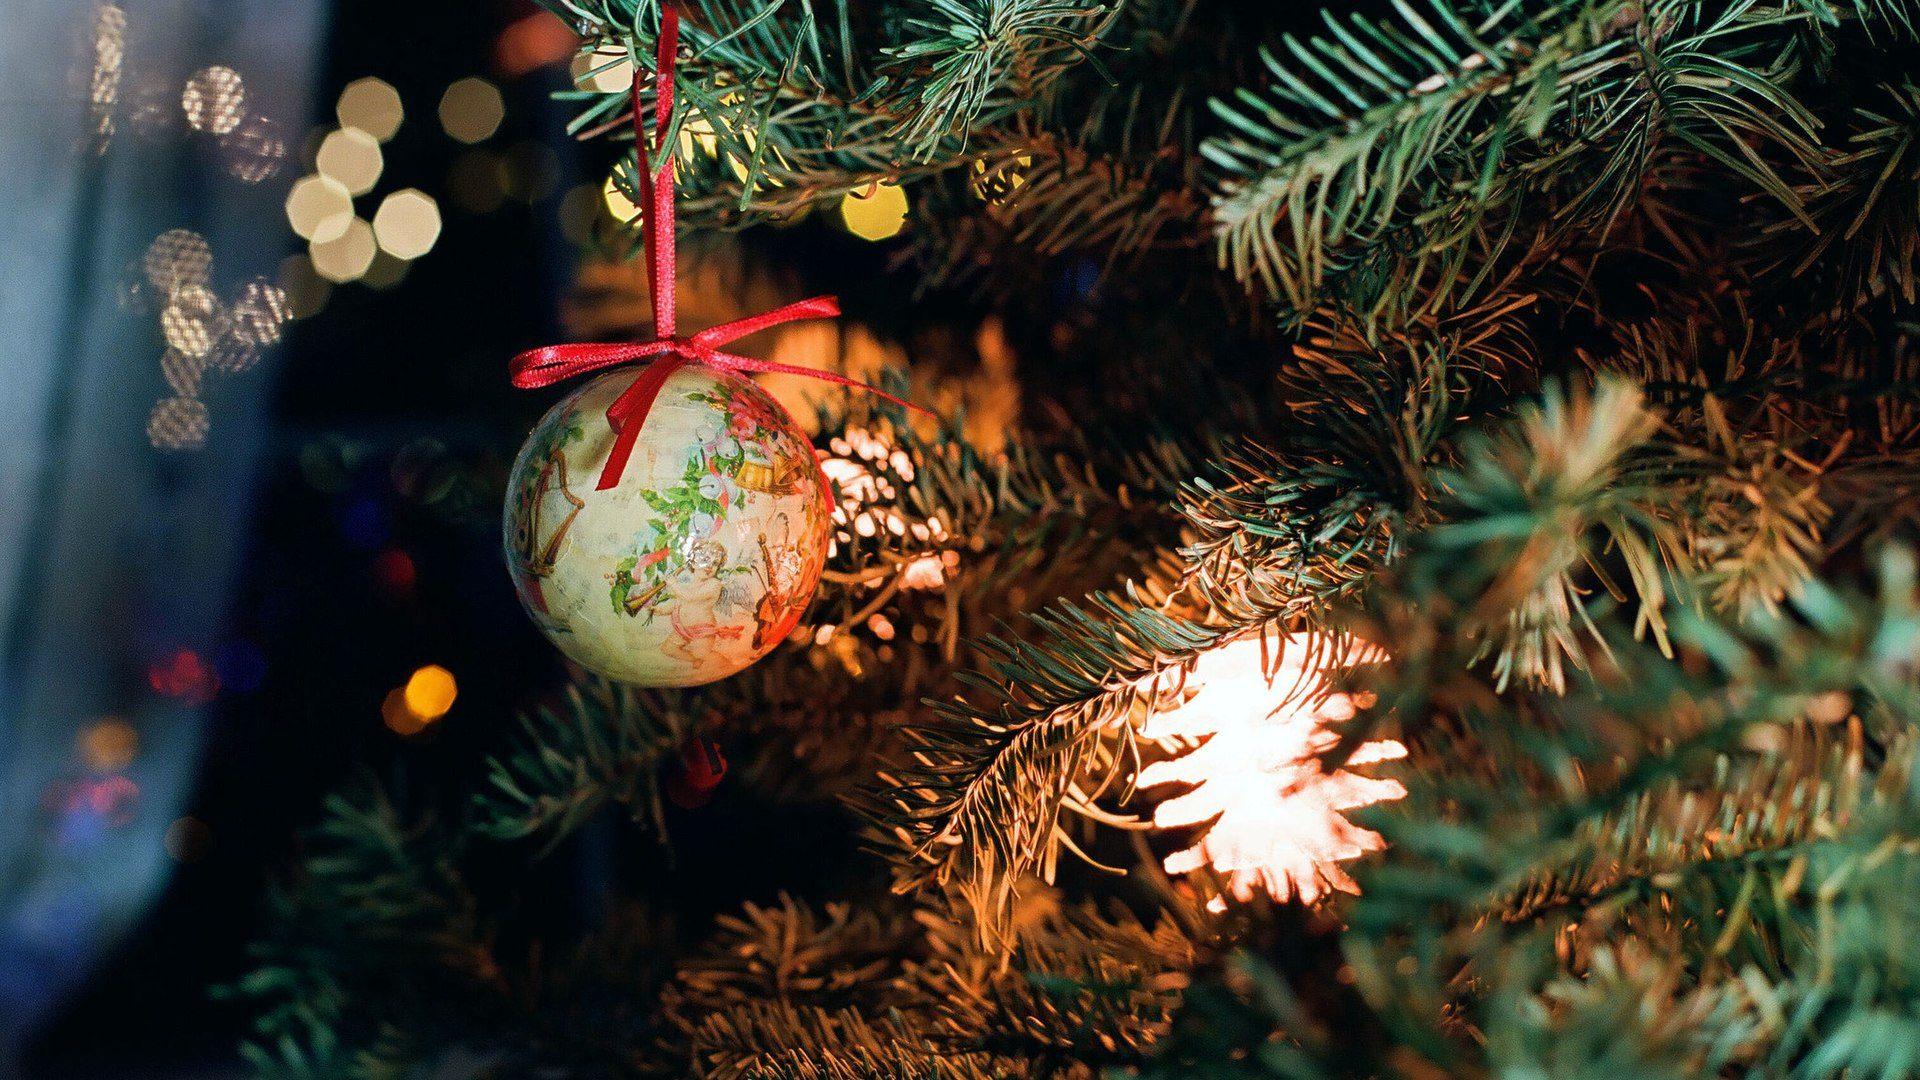 Decorative Image of Christmas Tree